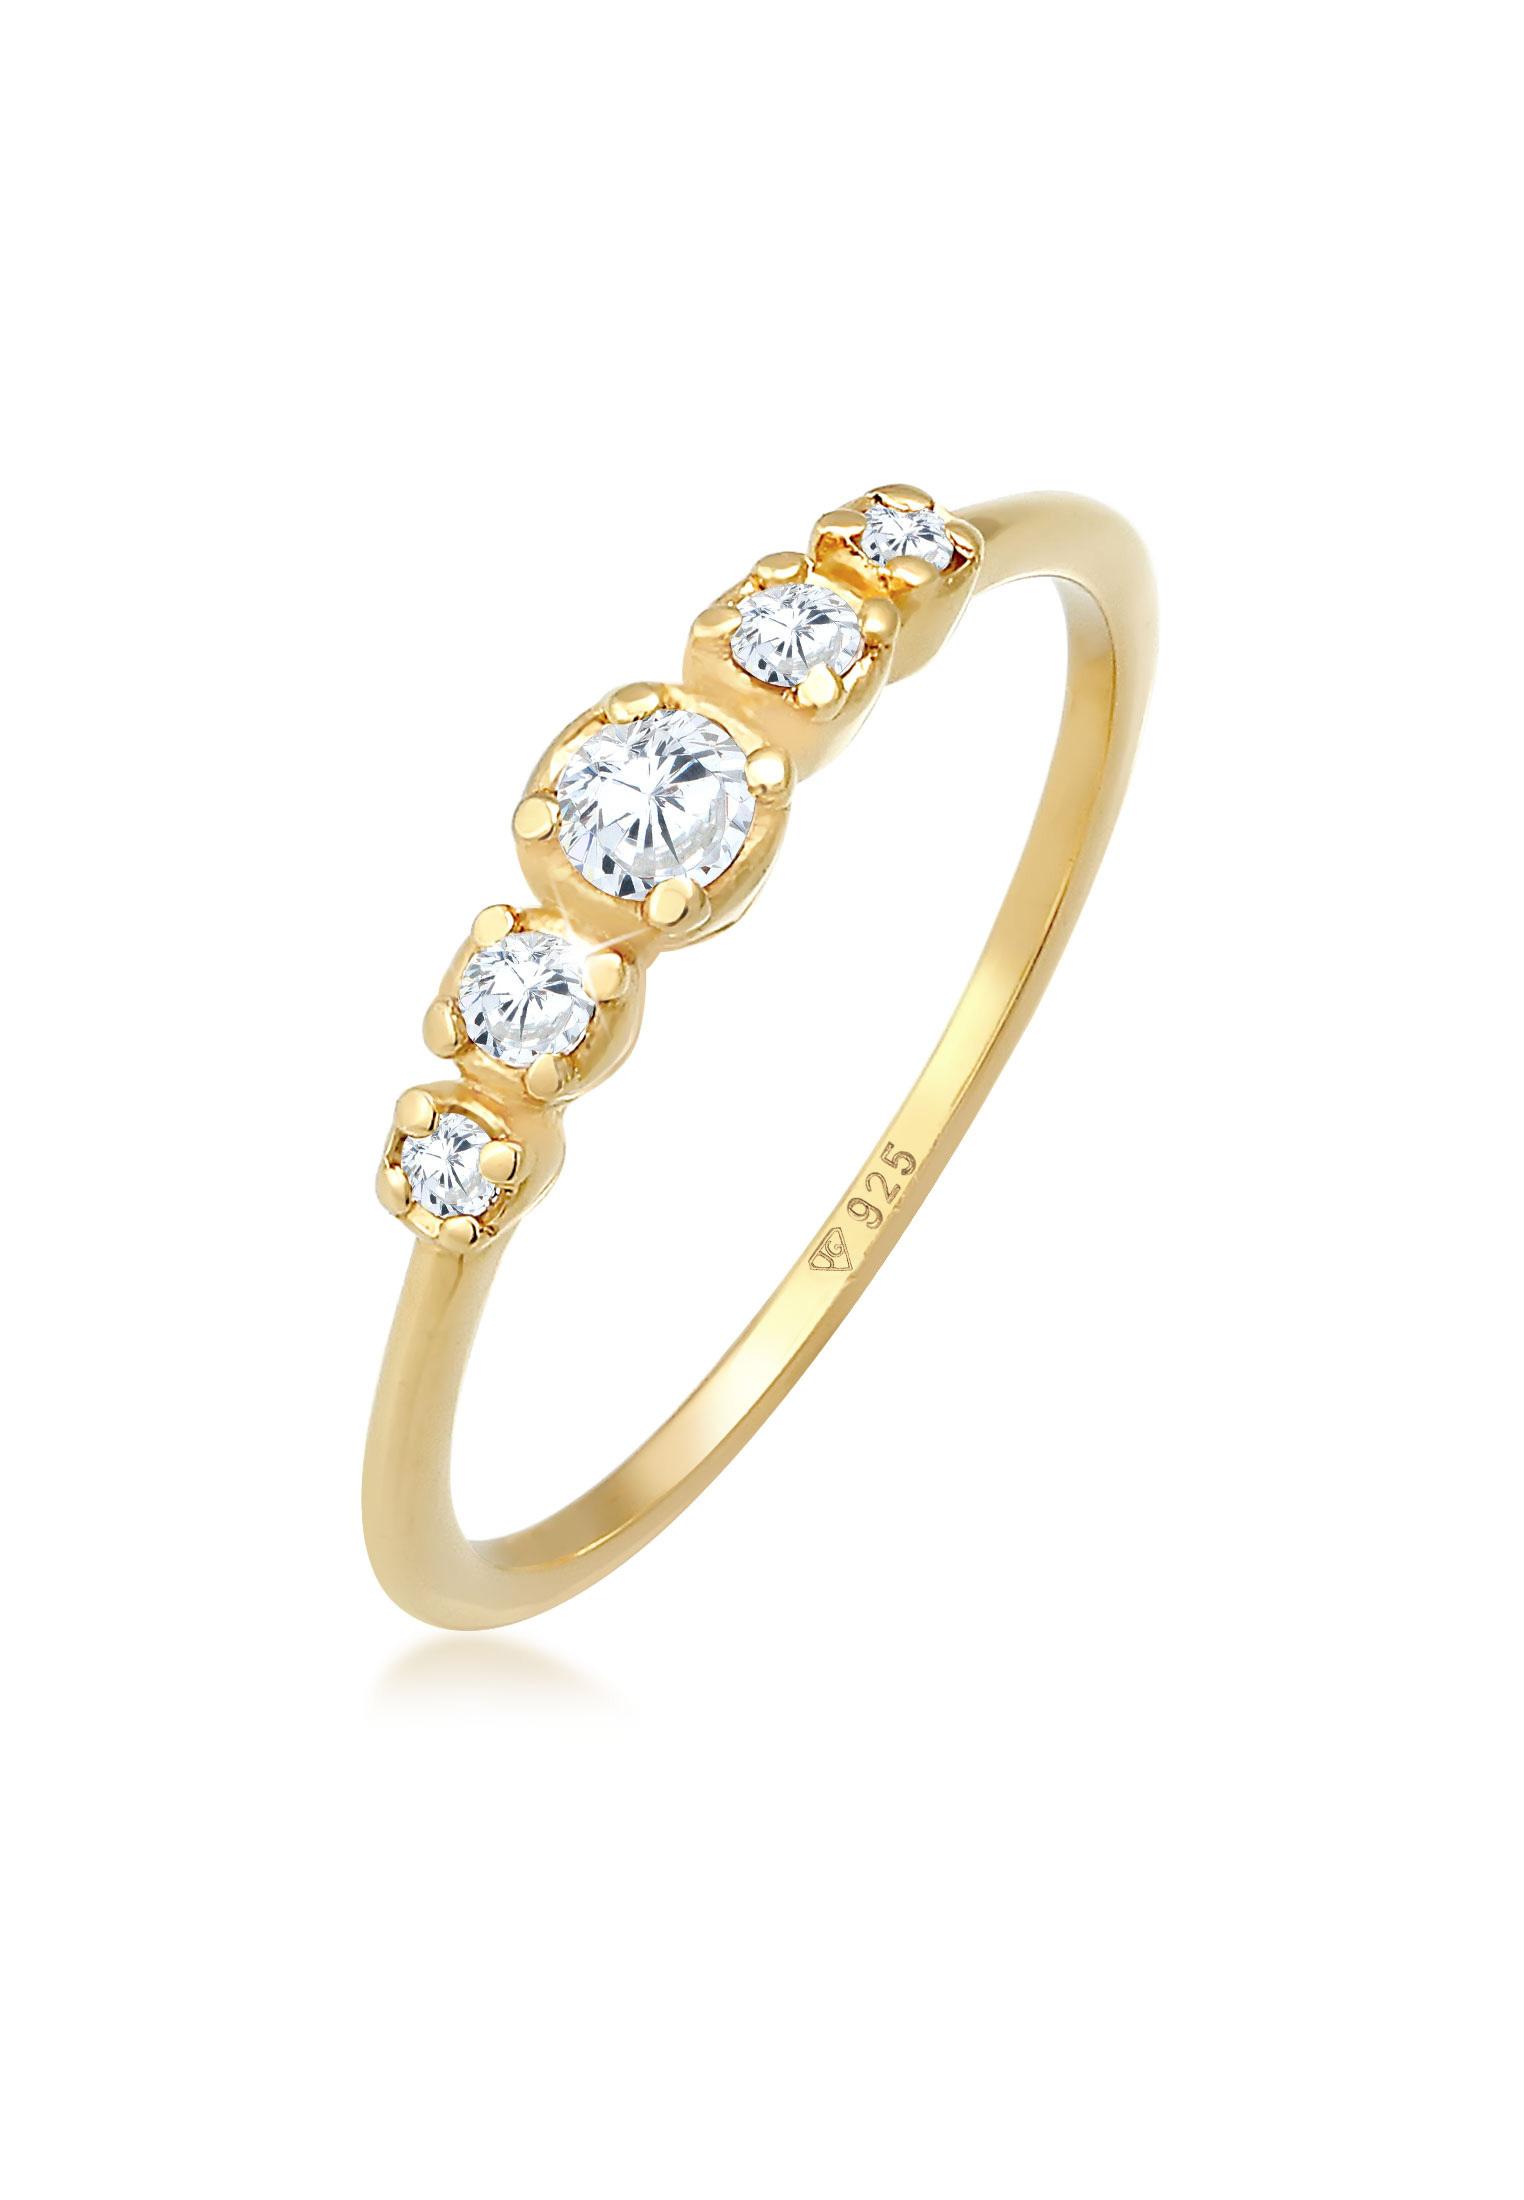 Verlobungsring   Zirkonia ( Weiß )   925 Sterling Silber vergoldet